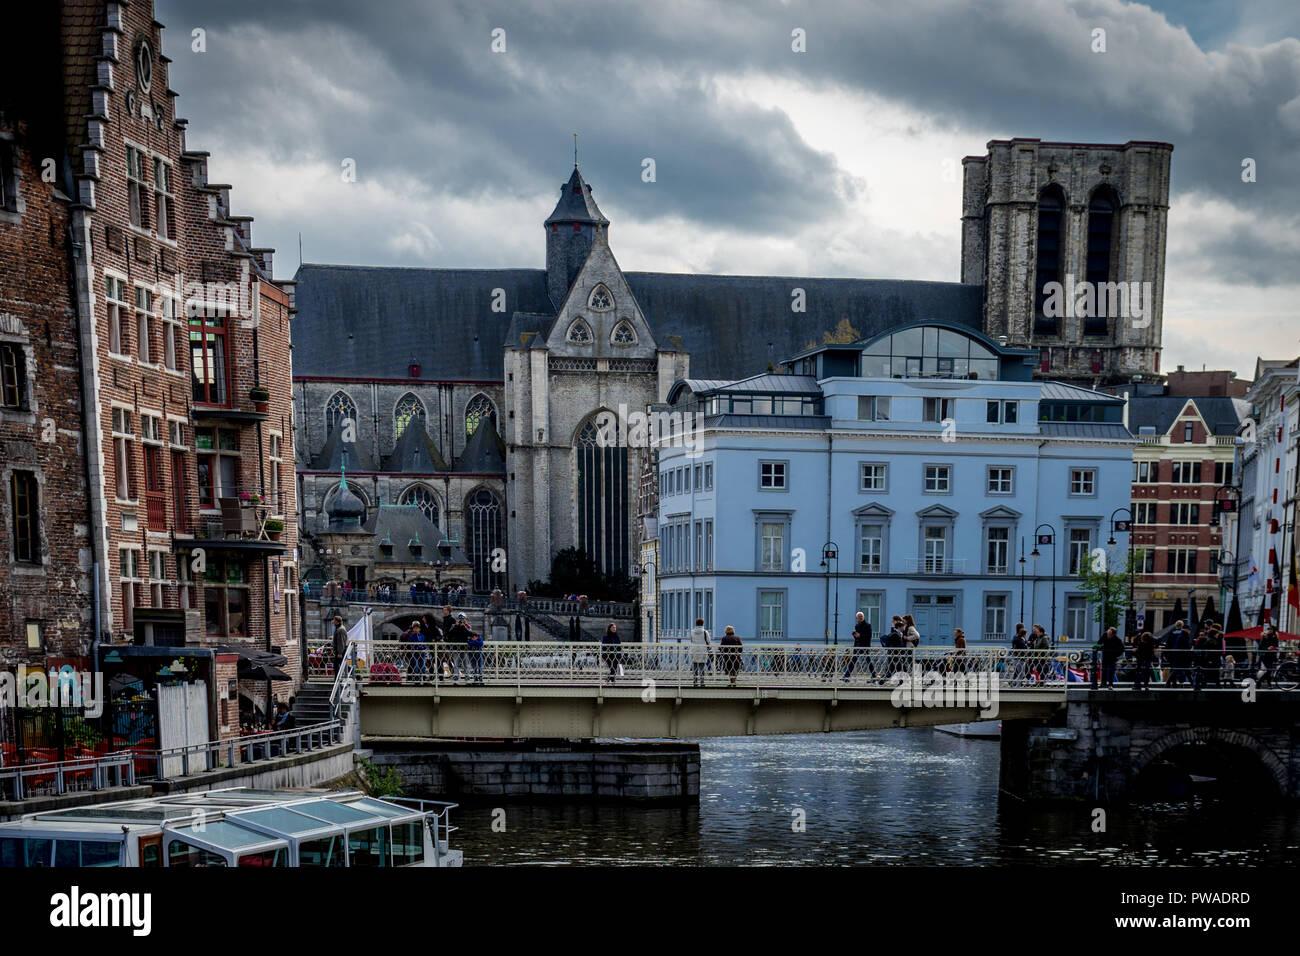 Ghent Belgium - April 15 : Toursists walk across the bridge near the Saint Michael's Church in Ghent, Belgium, Europe - Stock Image